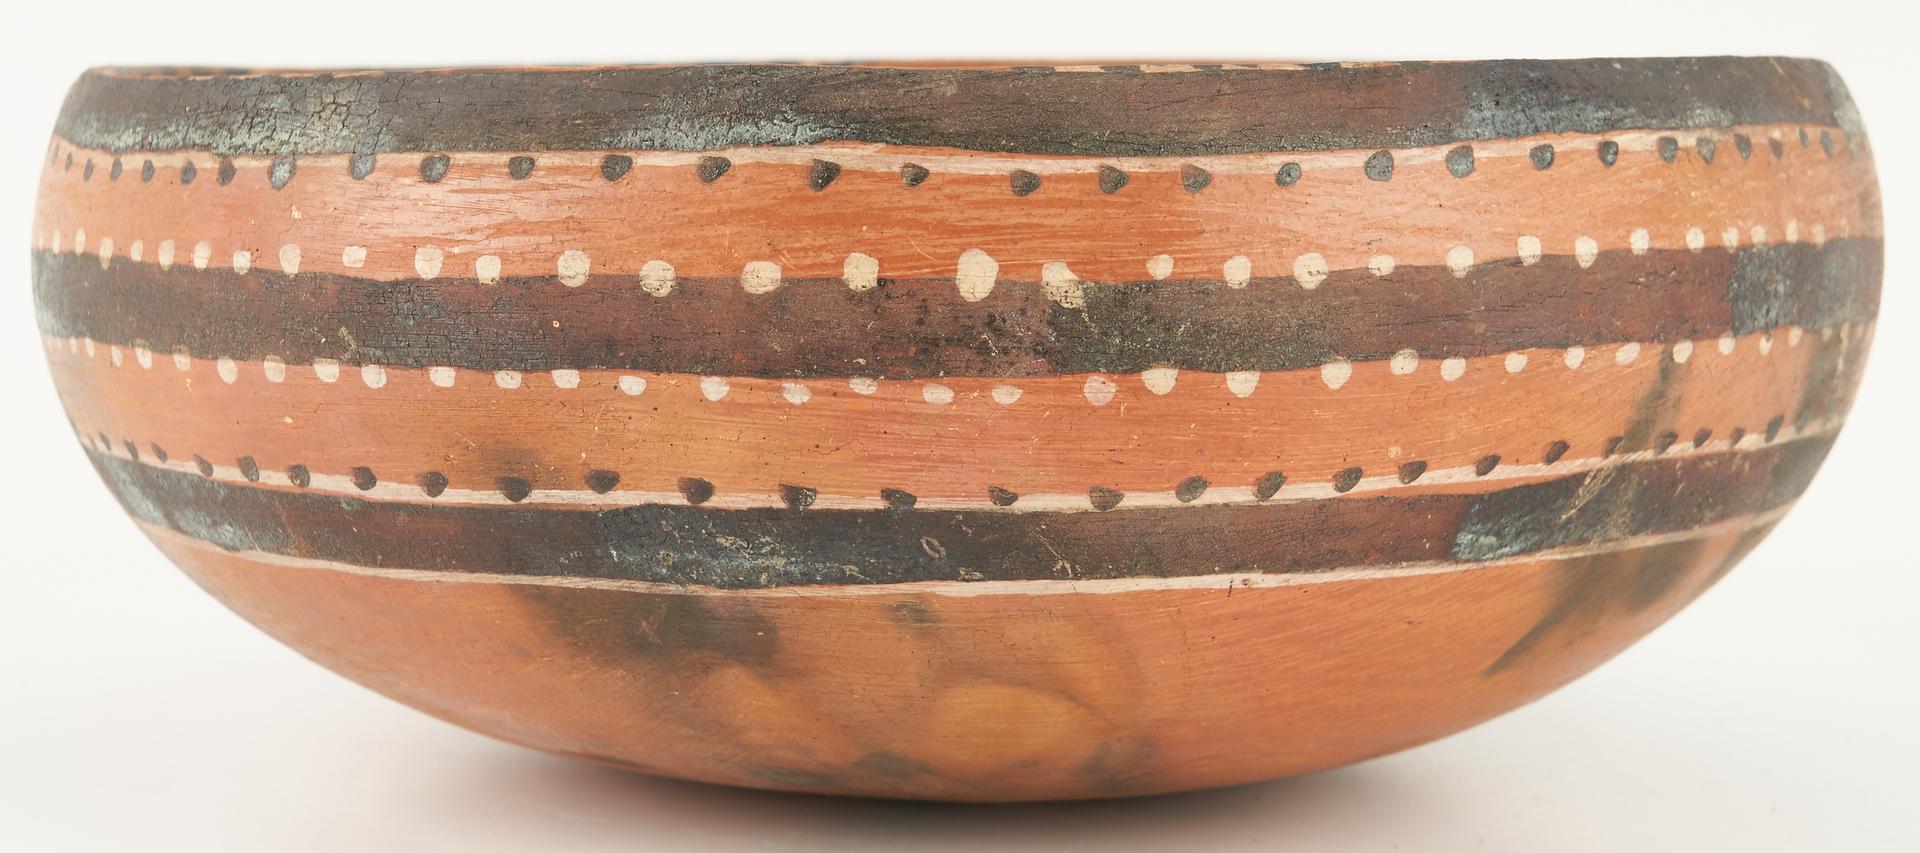 Lot 682: 2 Anasazi Culture Polychrome Bowls